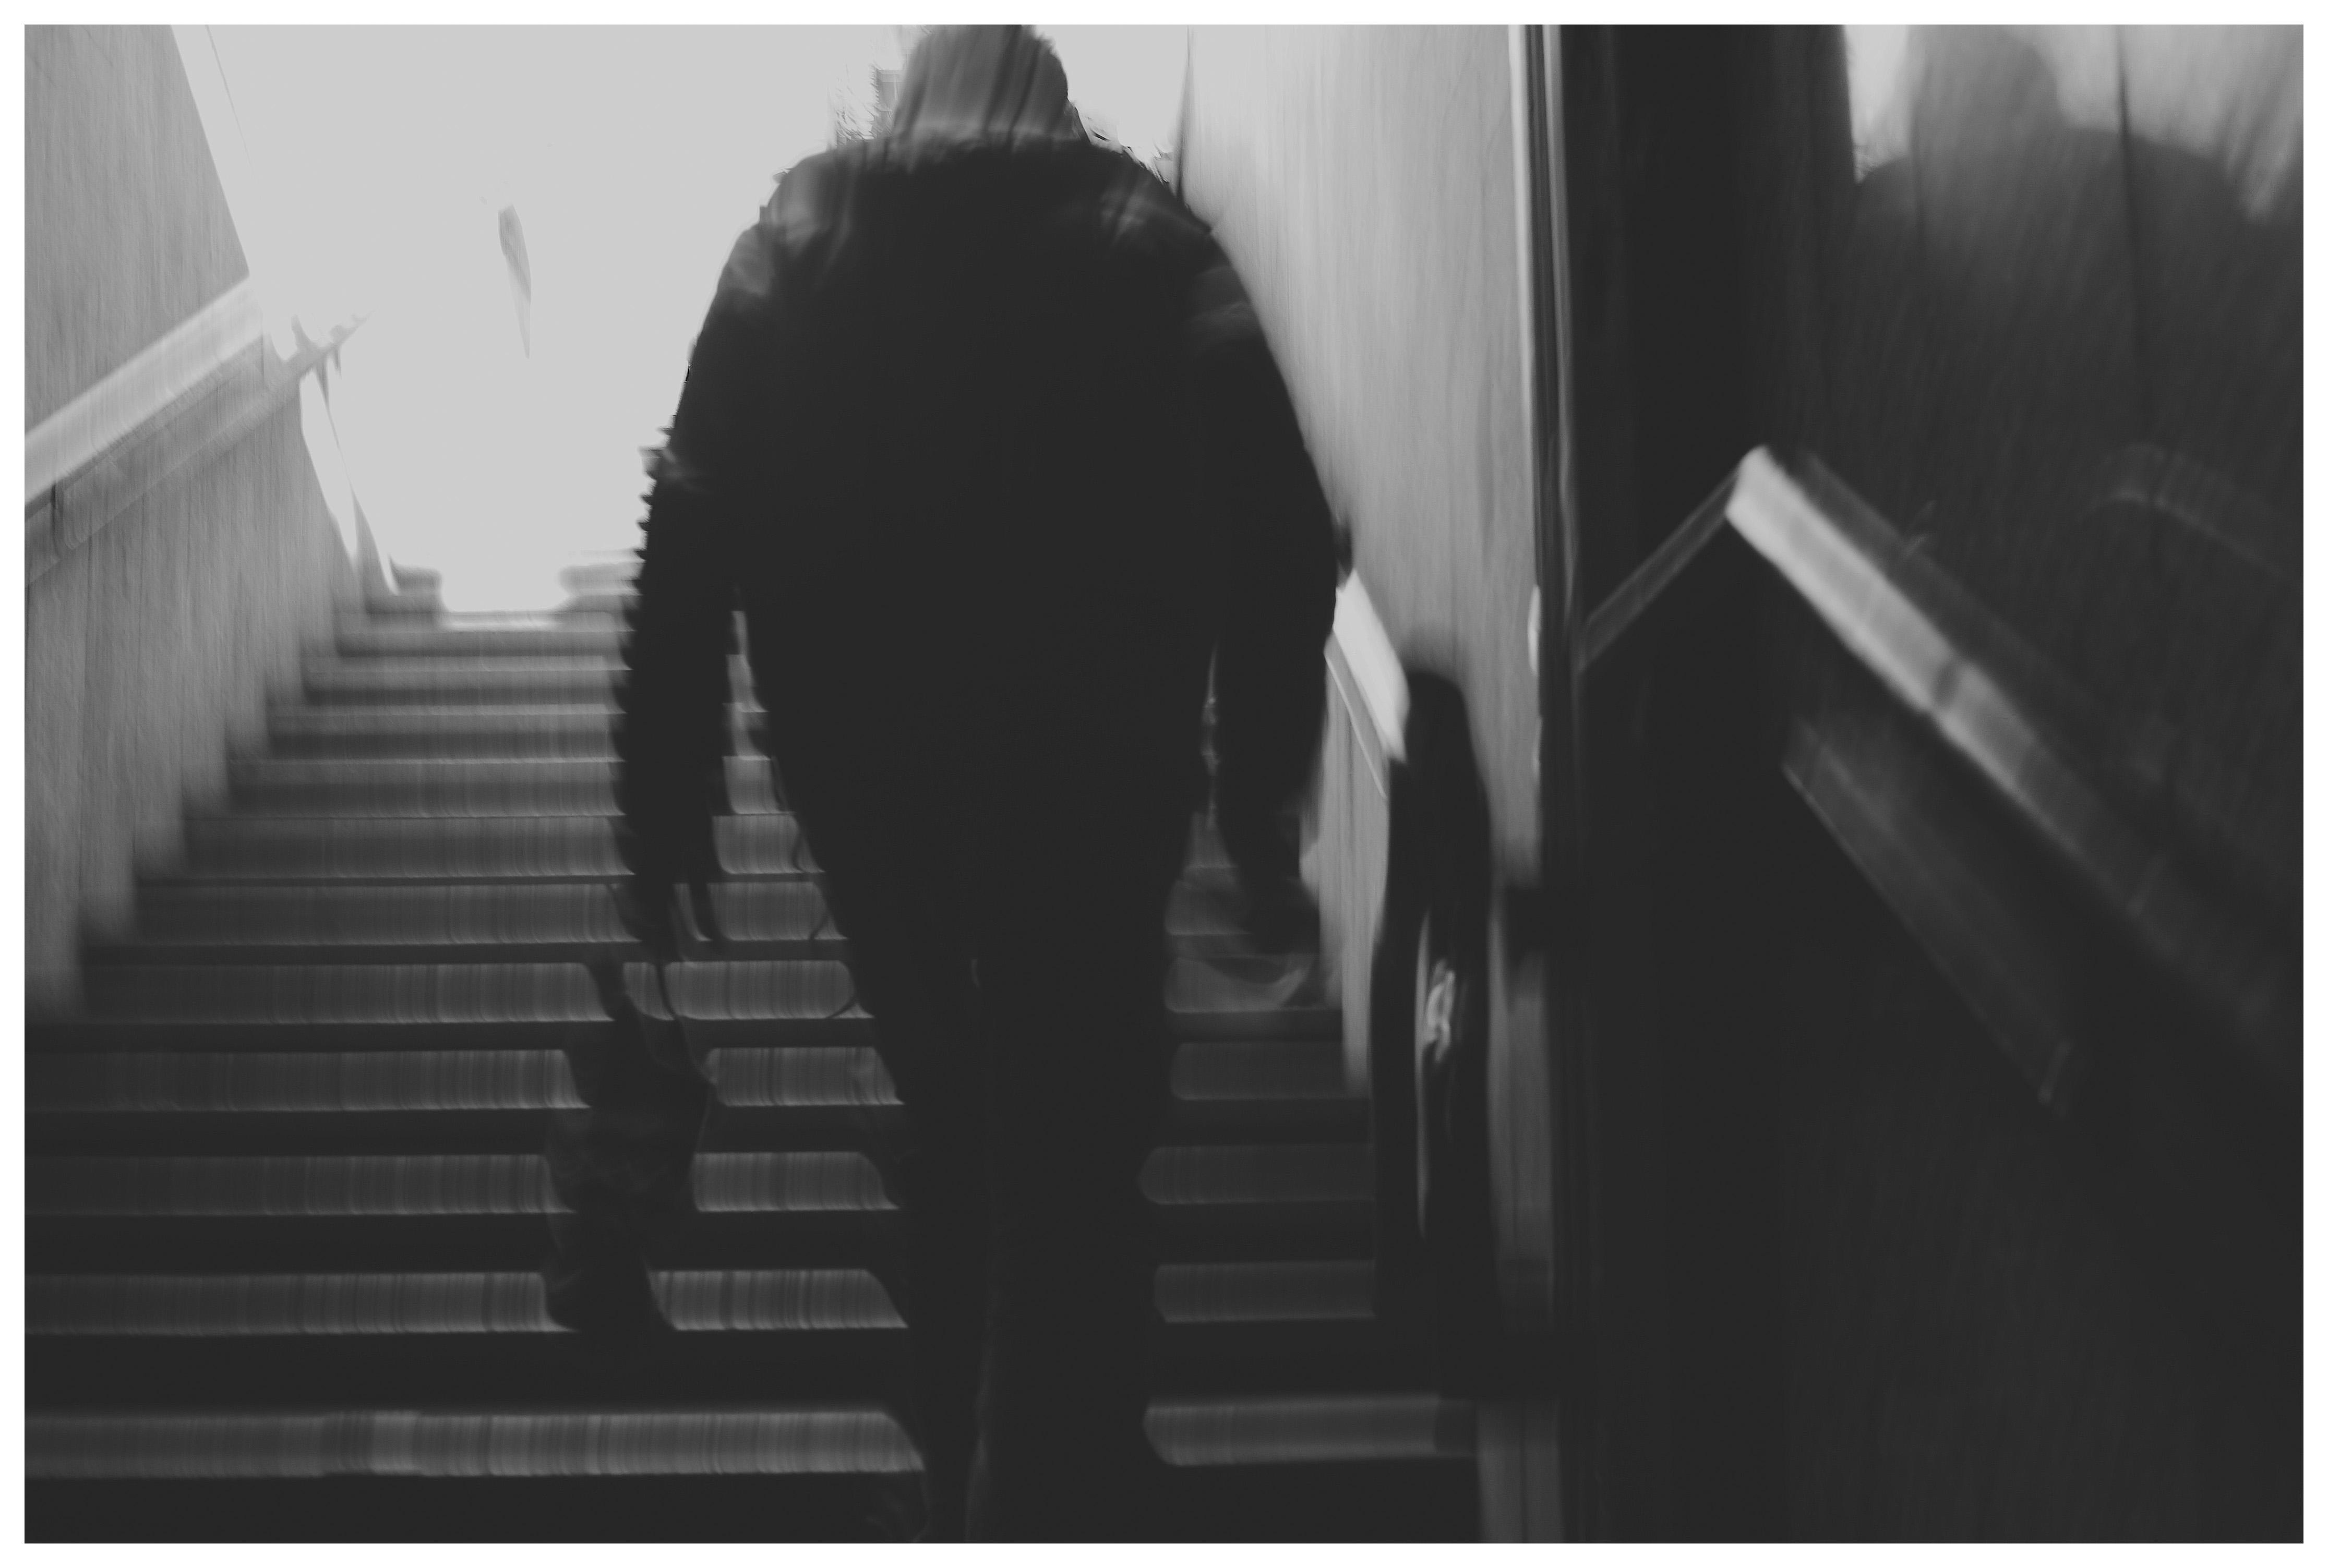 Fantasmi in metropolitana